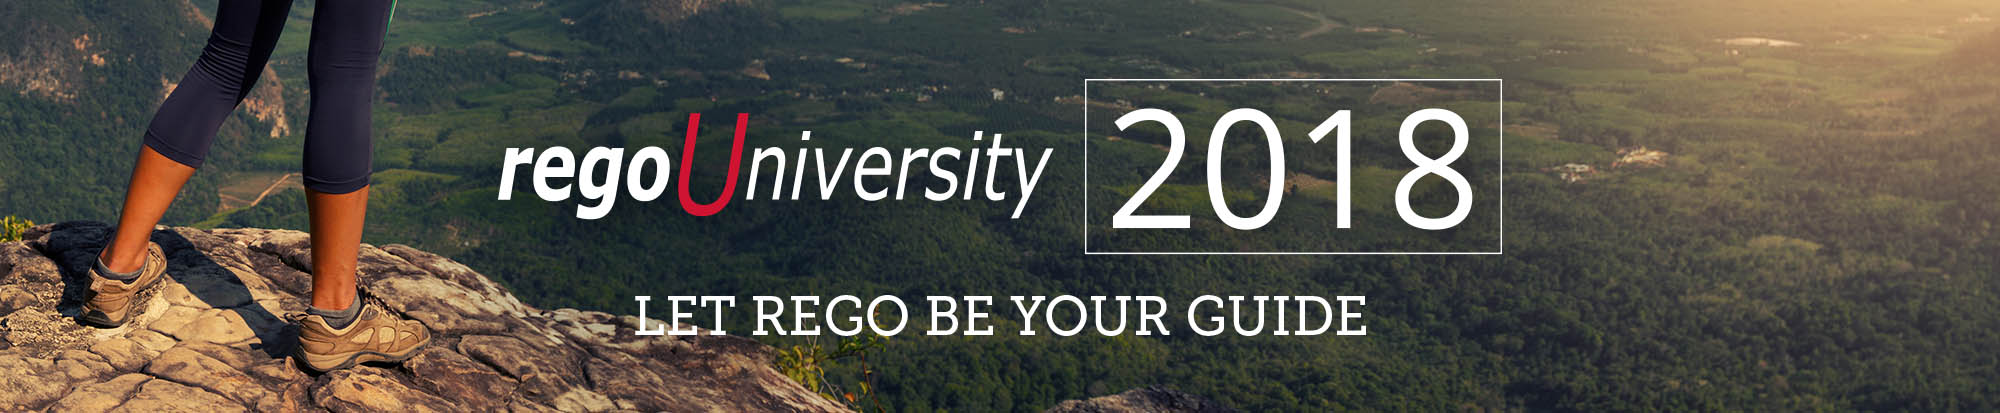 Rego University 2018